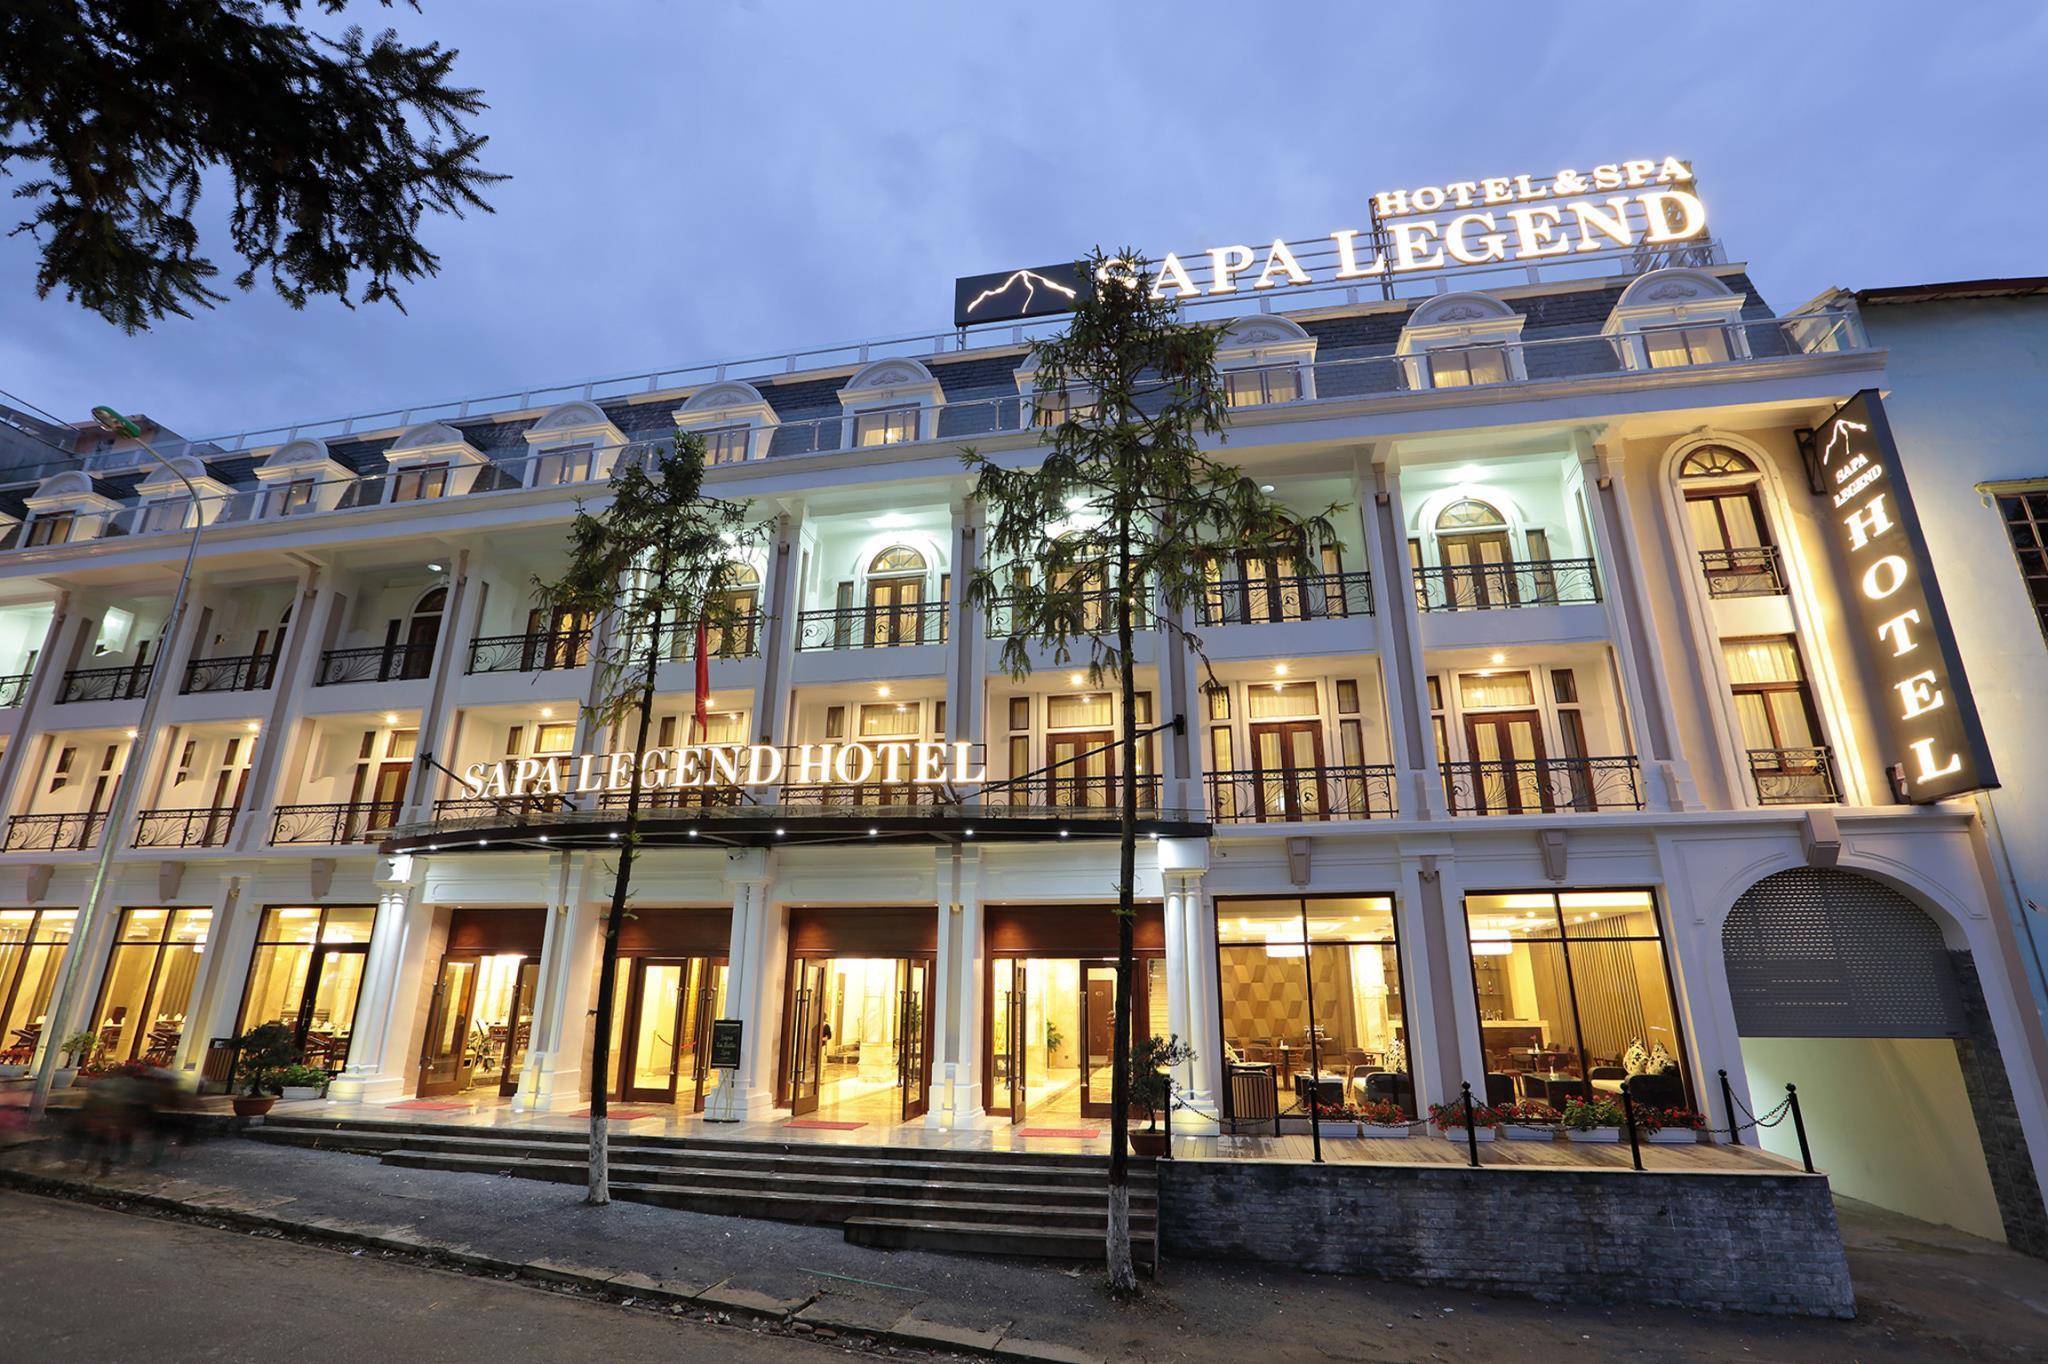 Sapa Legend Hotel And Spa